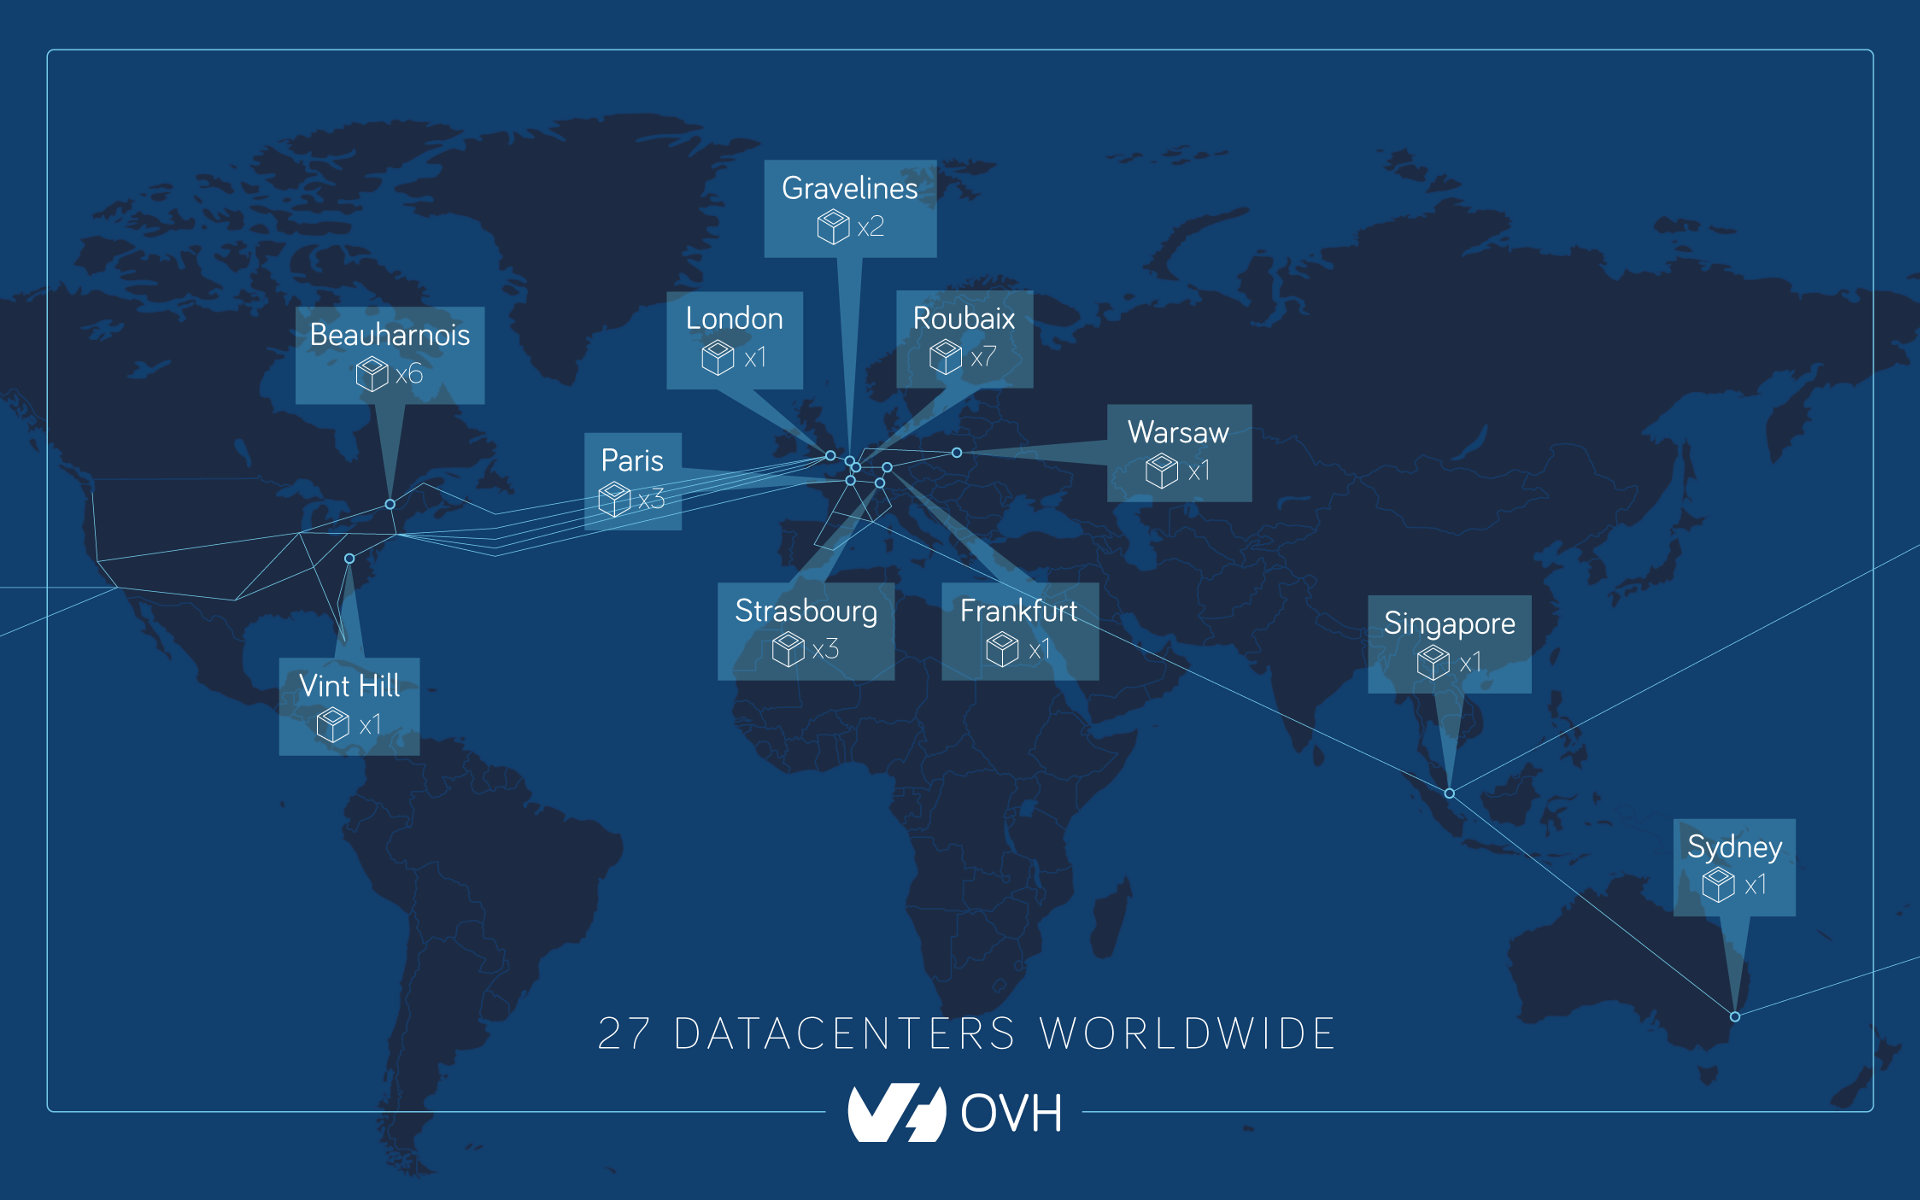 https://www.ovh.com/world/images/about-us/worldmap-dc-970px-EN.jpg